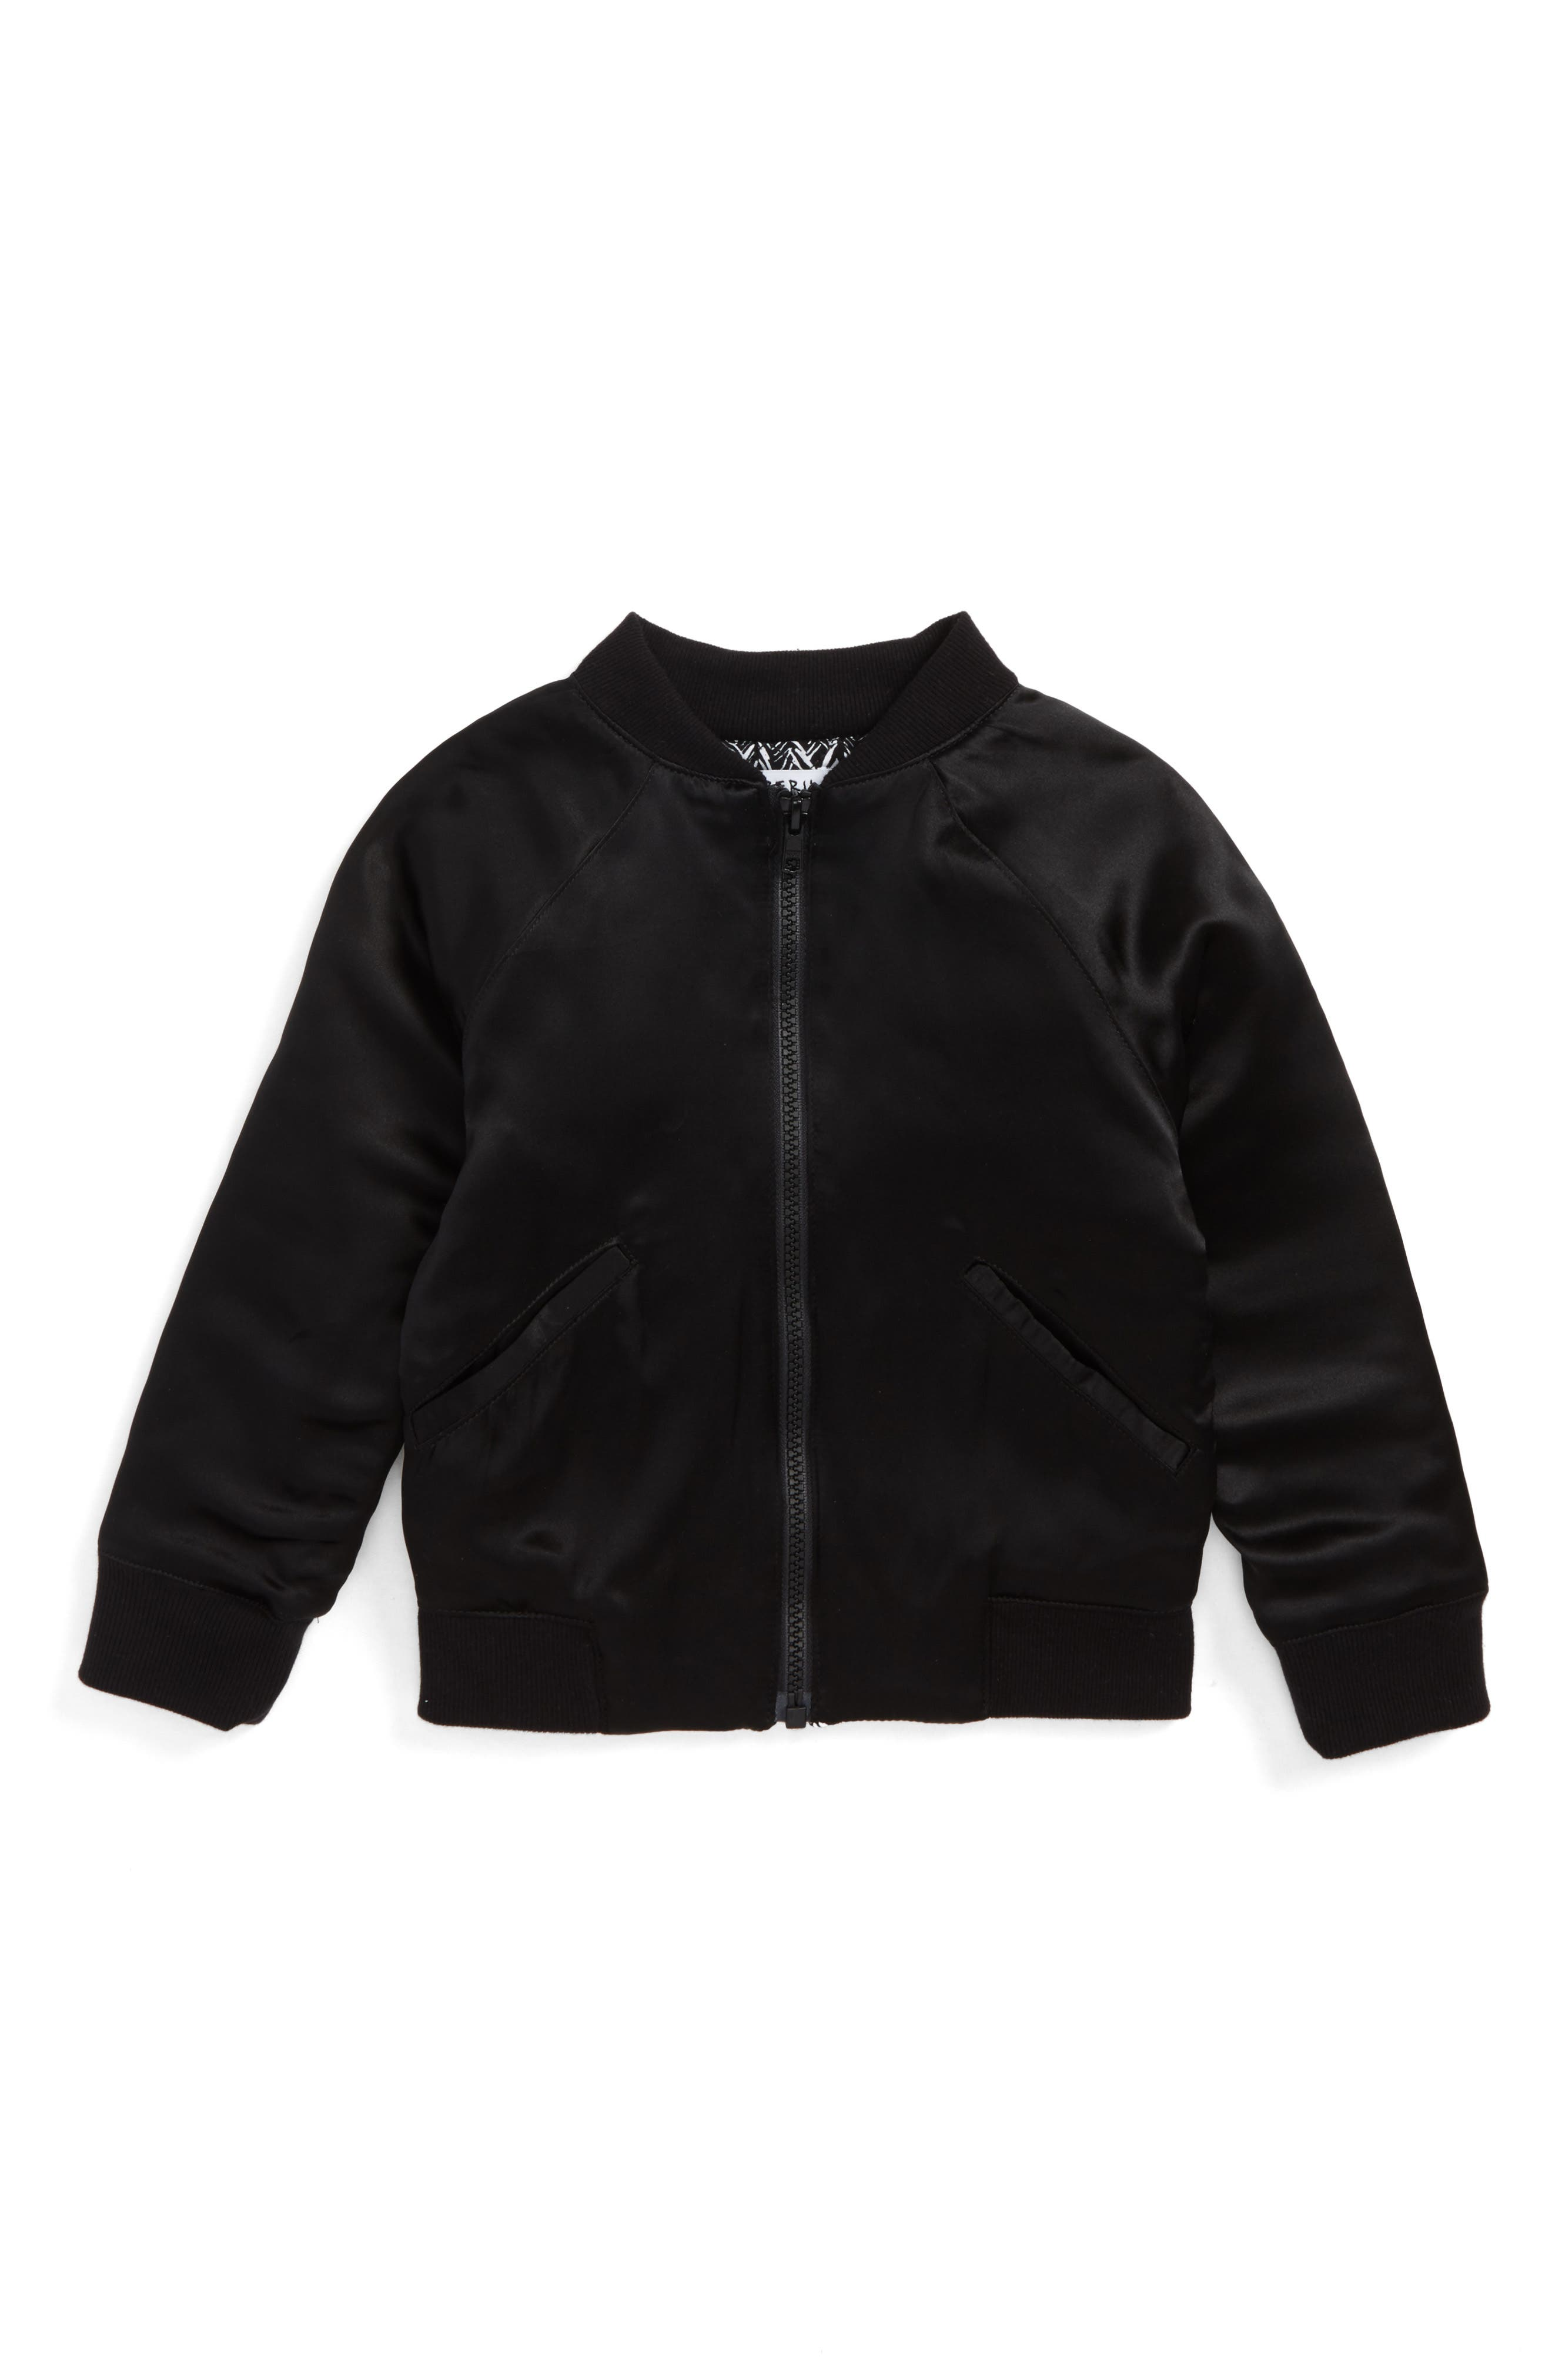 Tristan Silk Bomber Jacket,                         Main,                         color, Black